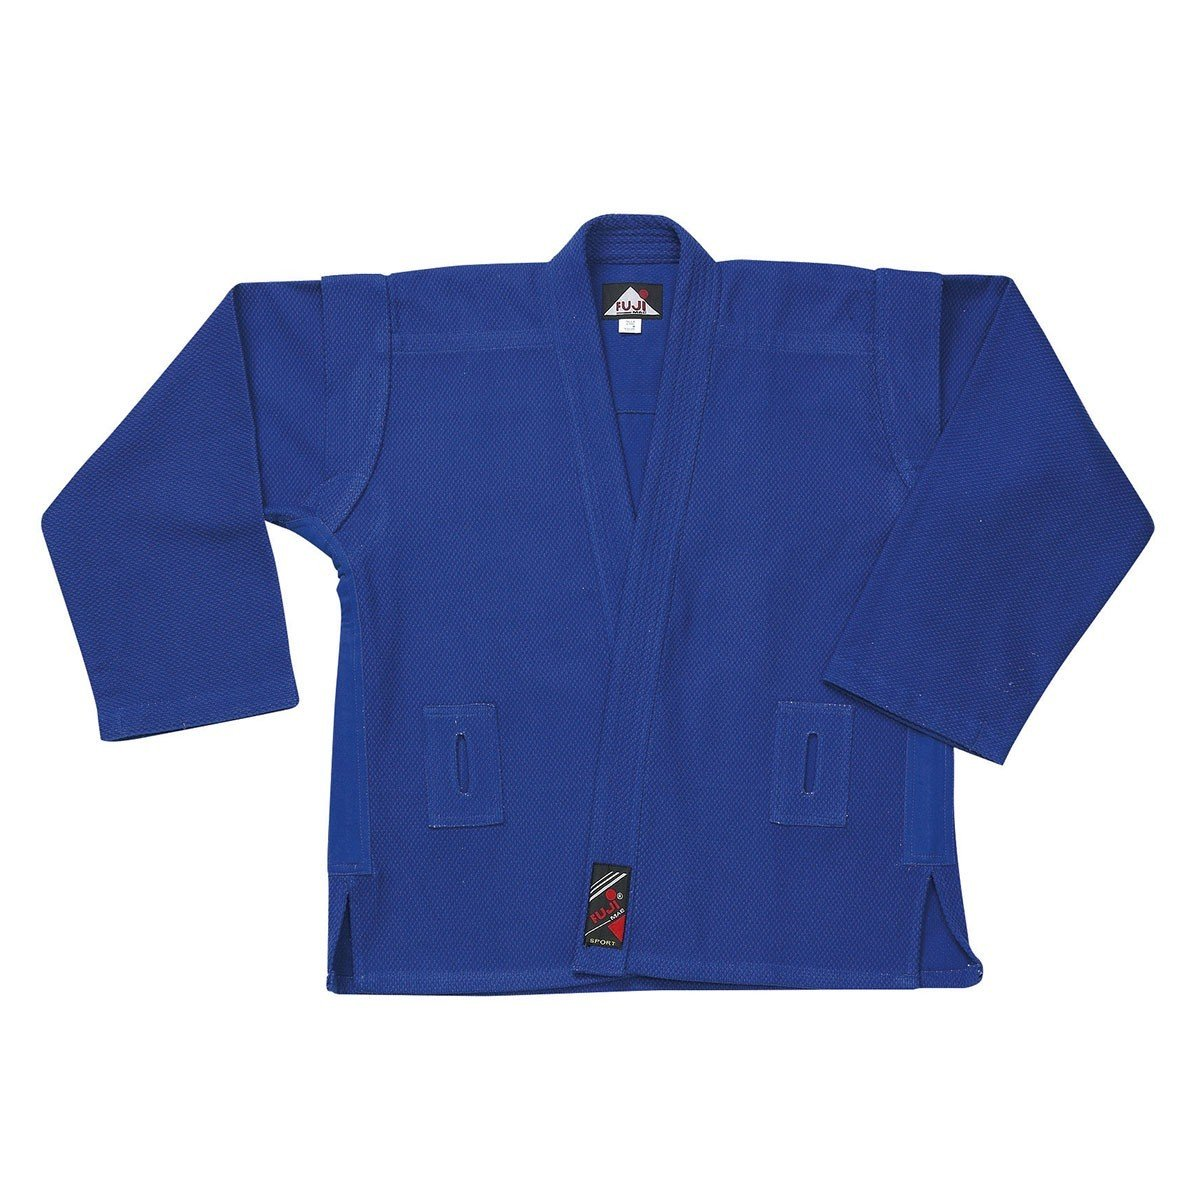 Fuji kurka//Sambo Chaqueta Azul Mae